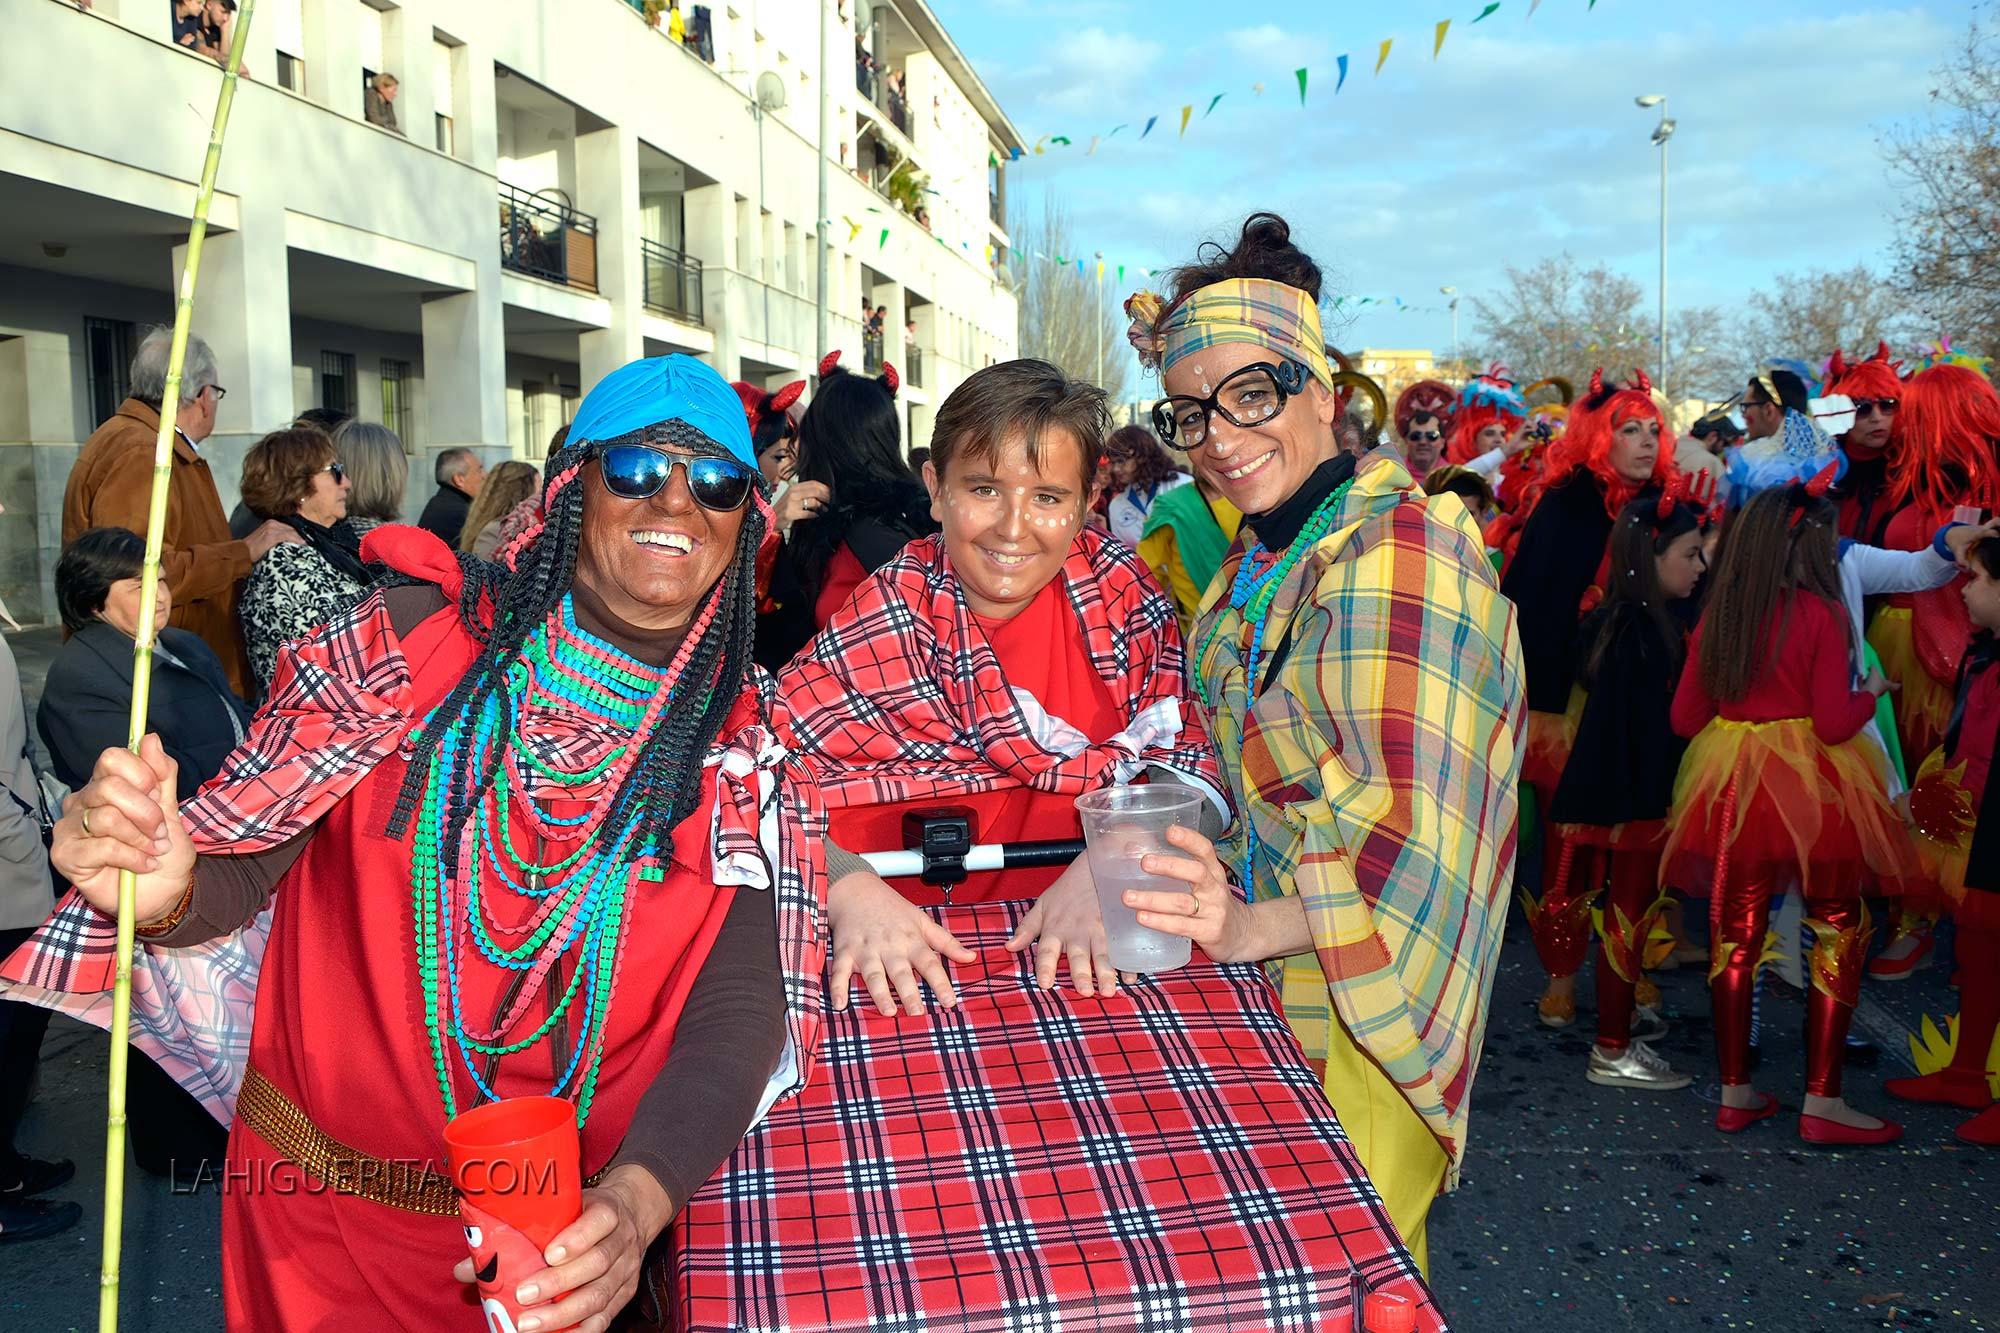 cabalgata carnaval isla cristina _DSC0789